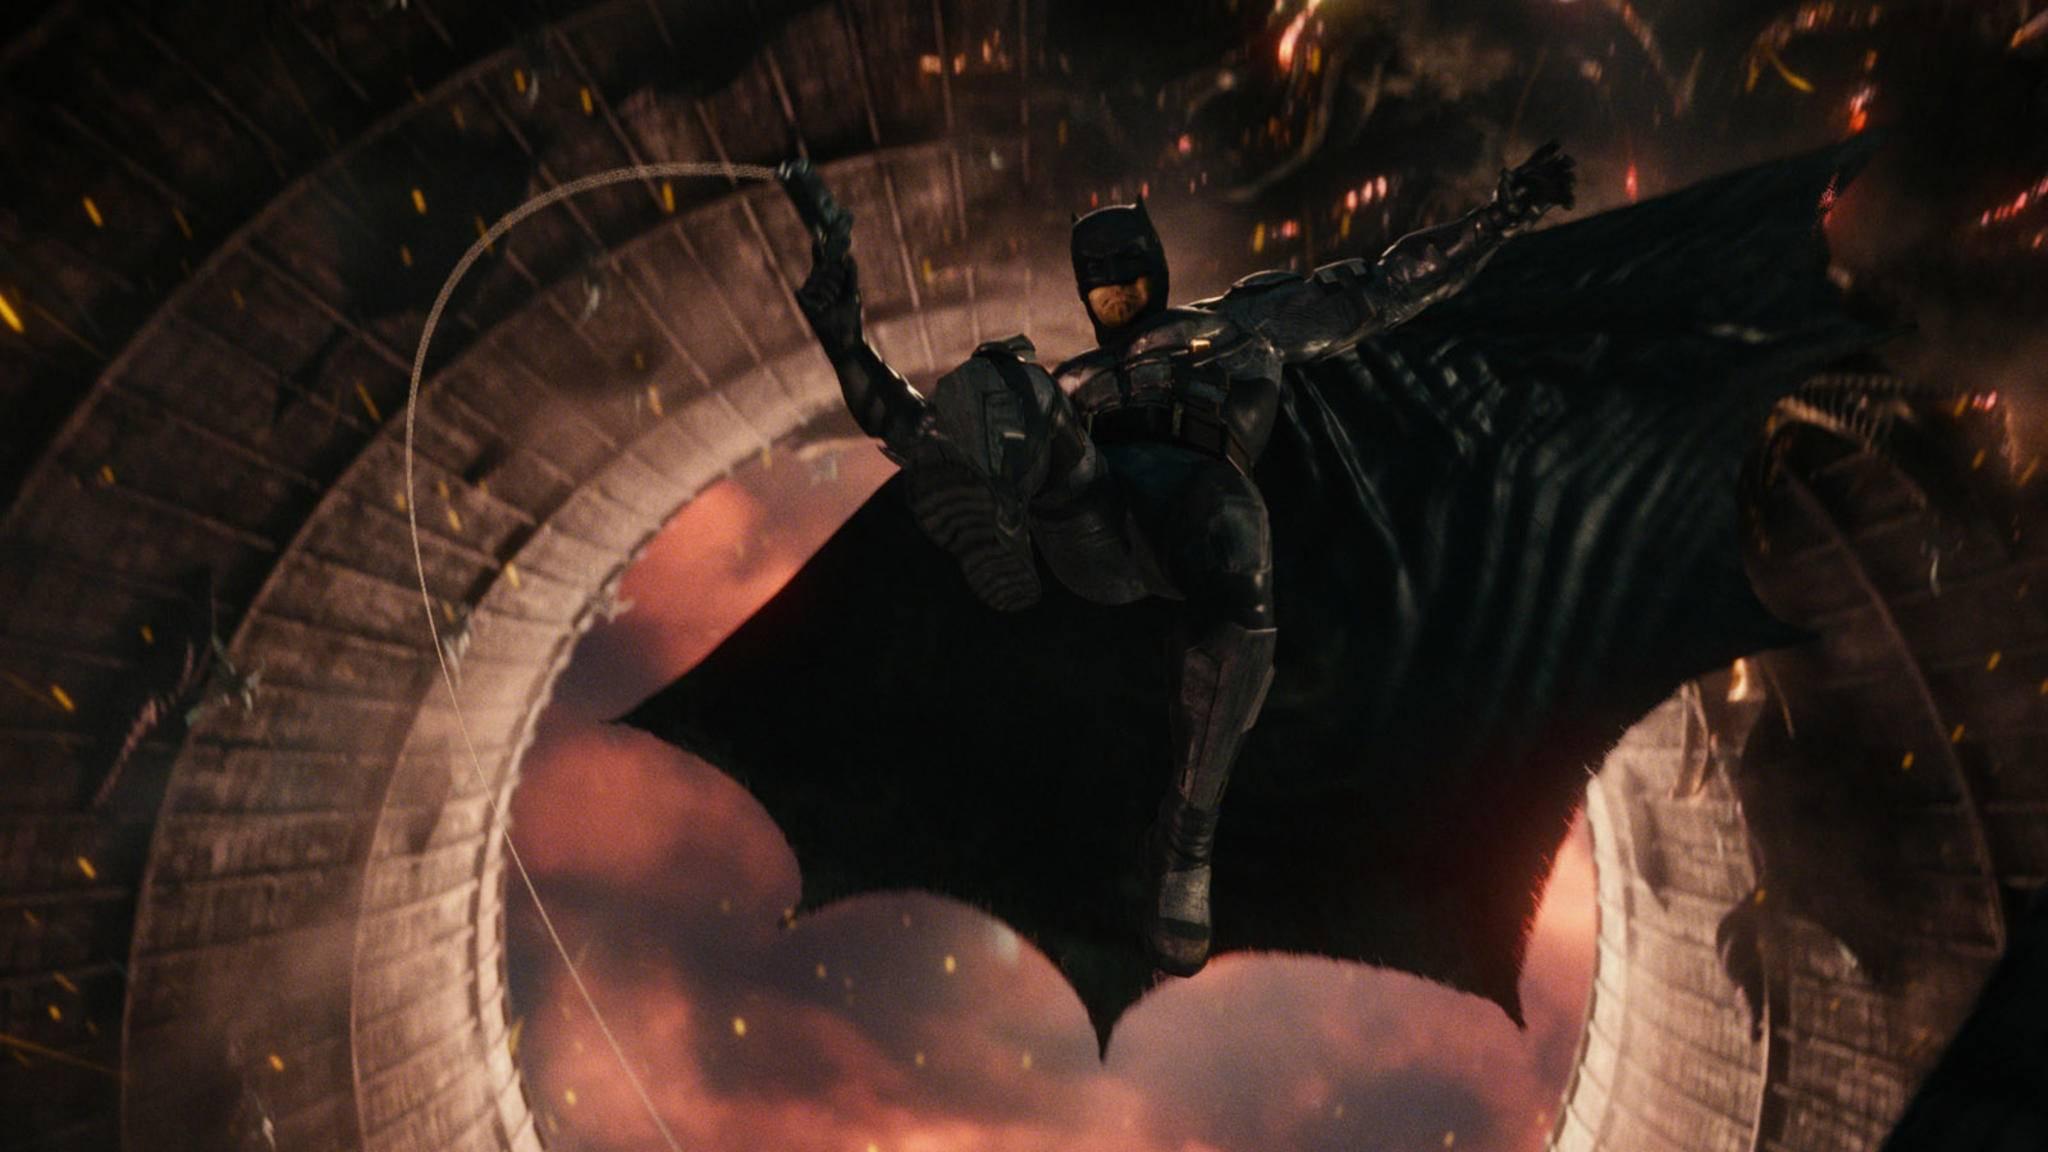 Bald segelt Robert Pattinson im Batsuit heran!